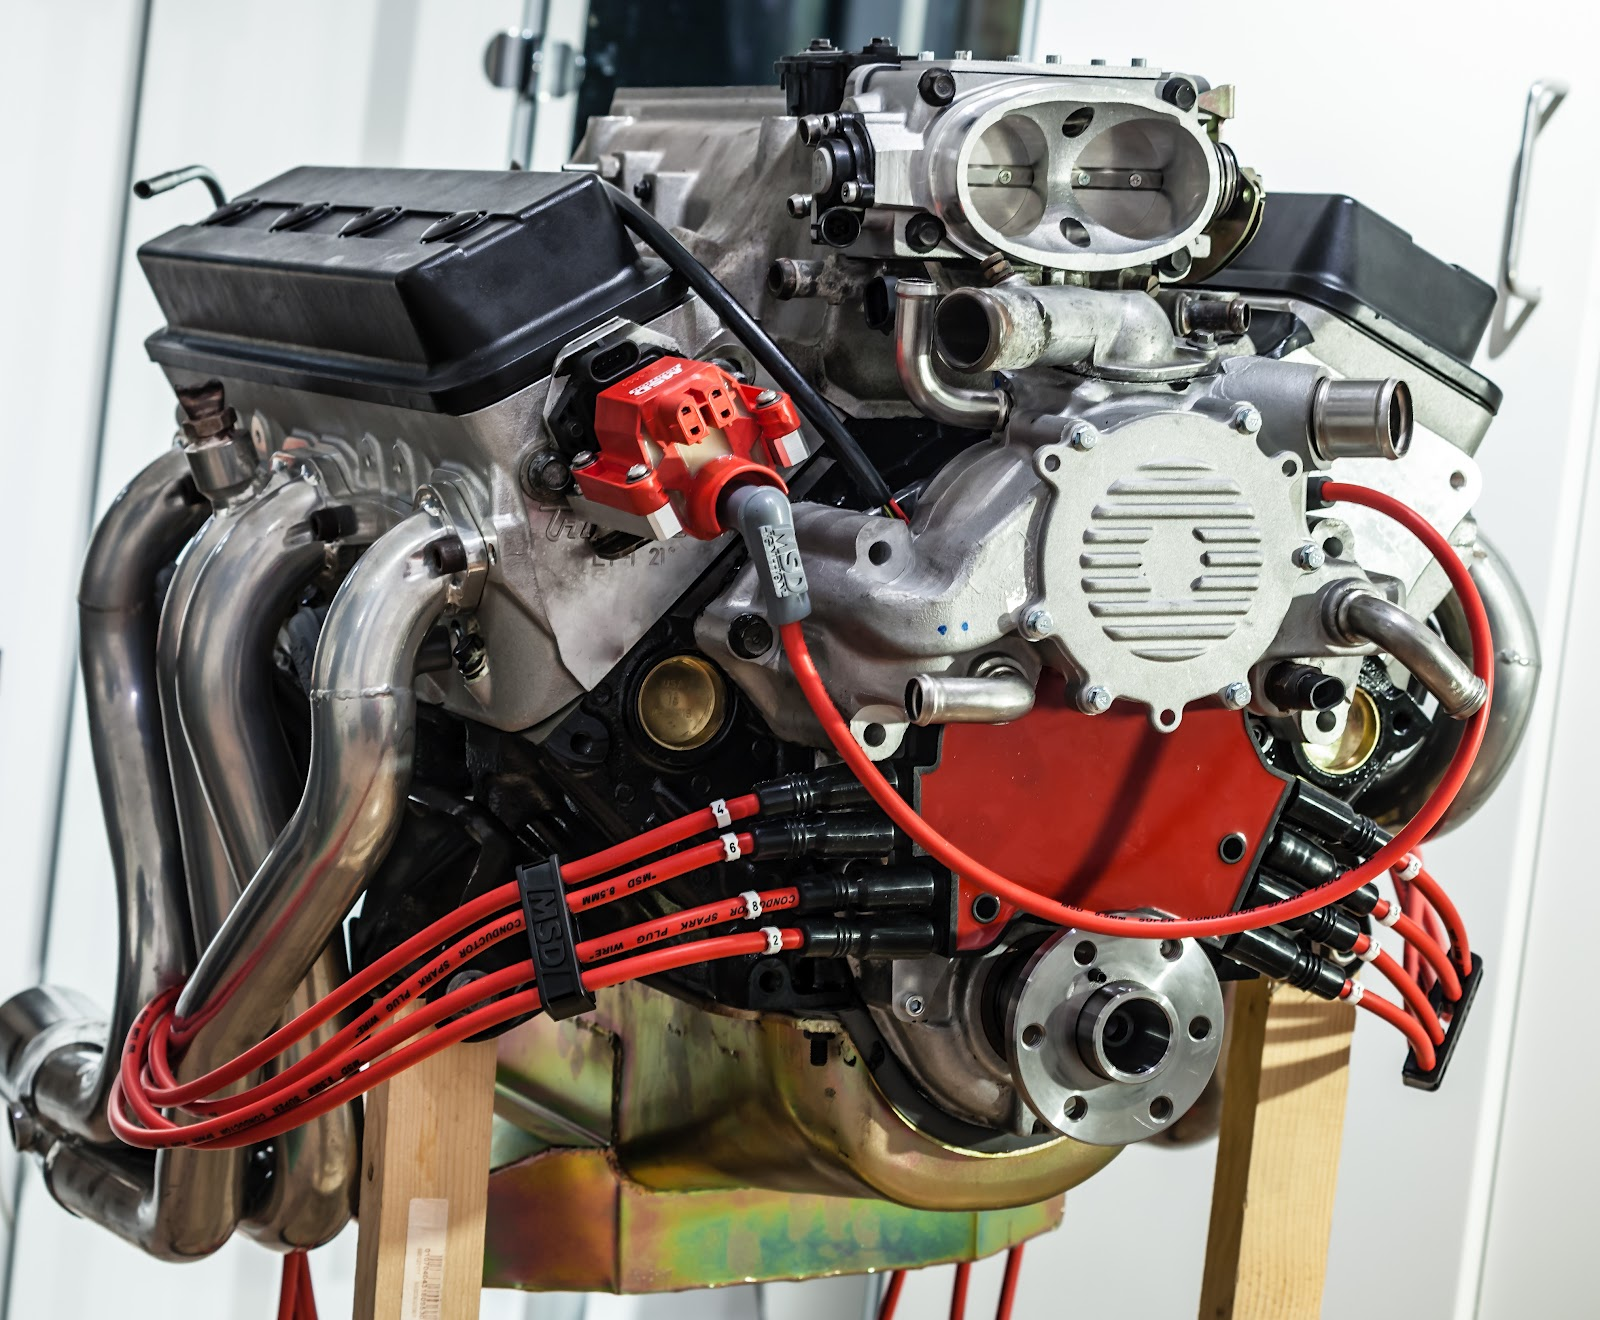 1993 corvette engine shuts off immediately corvetteforum chevrolet corvette forum discussion [ 1600 x 1320 Pixel ]